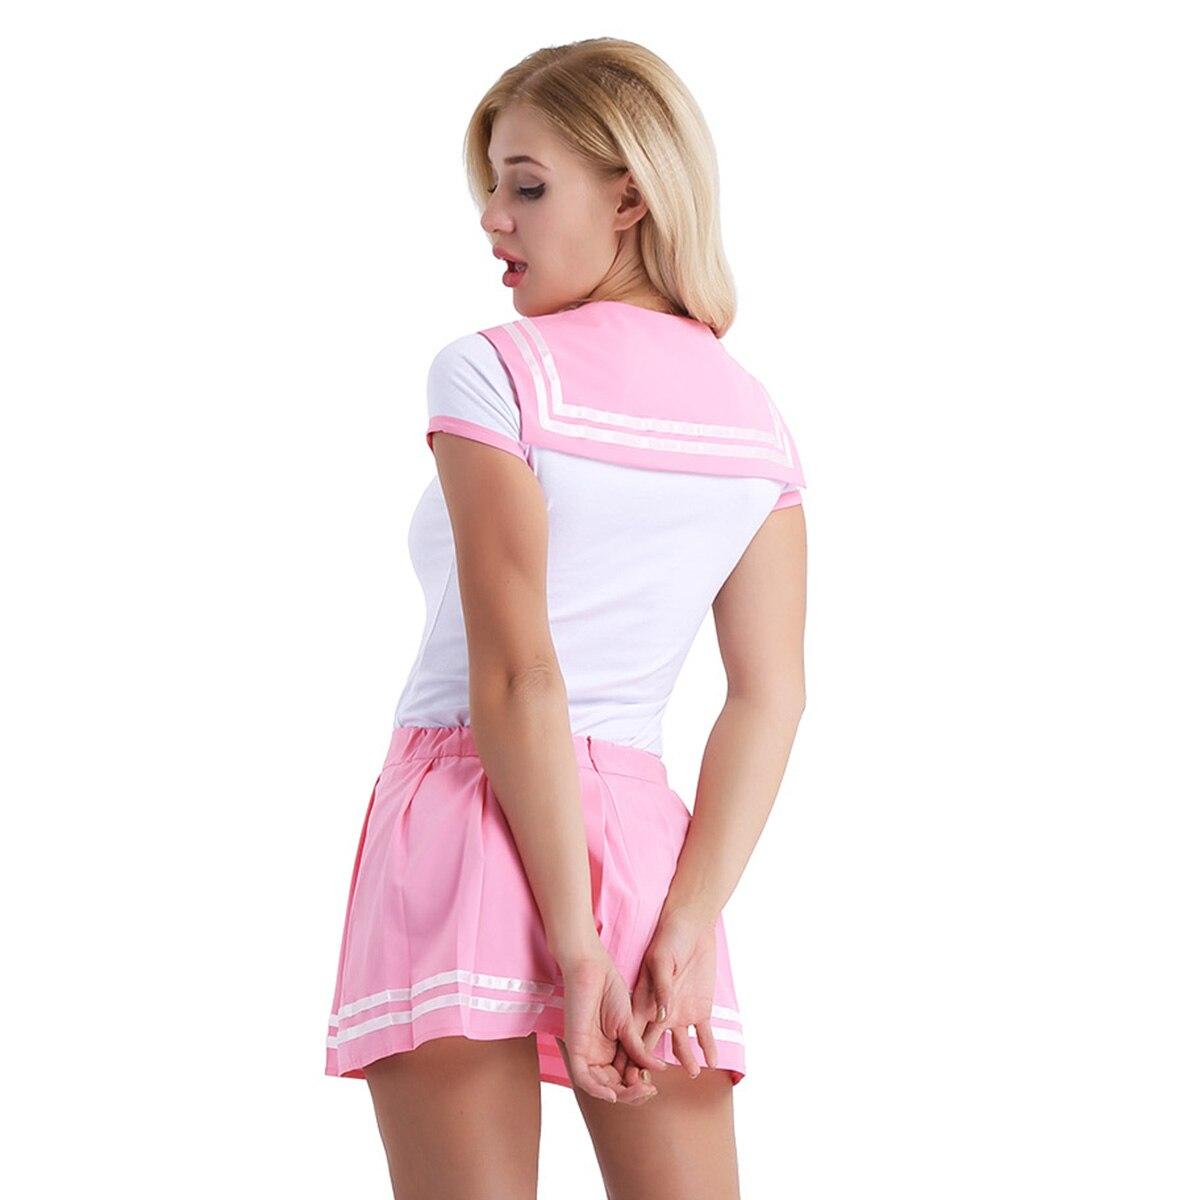 Image 3 - Iiniim feminino adulto roupas de bebê aberto virilha escola meninas sexy macacão com mini saia plissada cosplay trajes festa clubwearFantasias Sexy   -